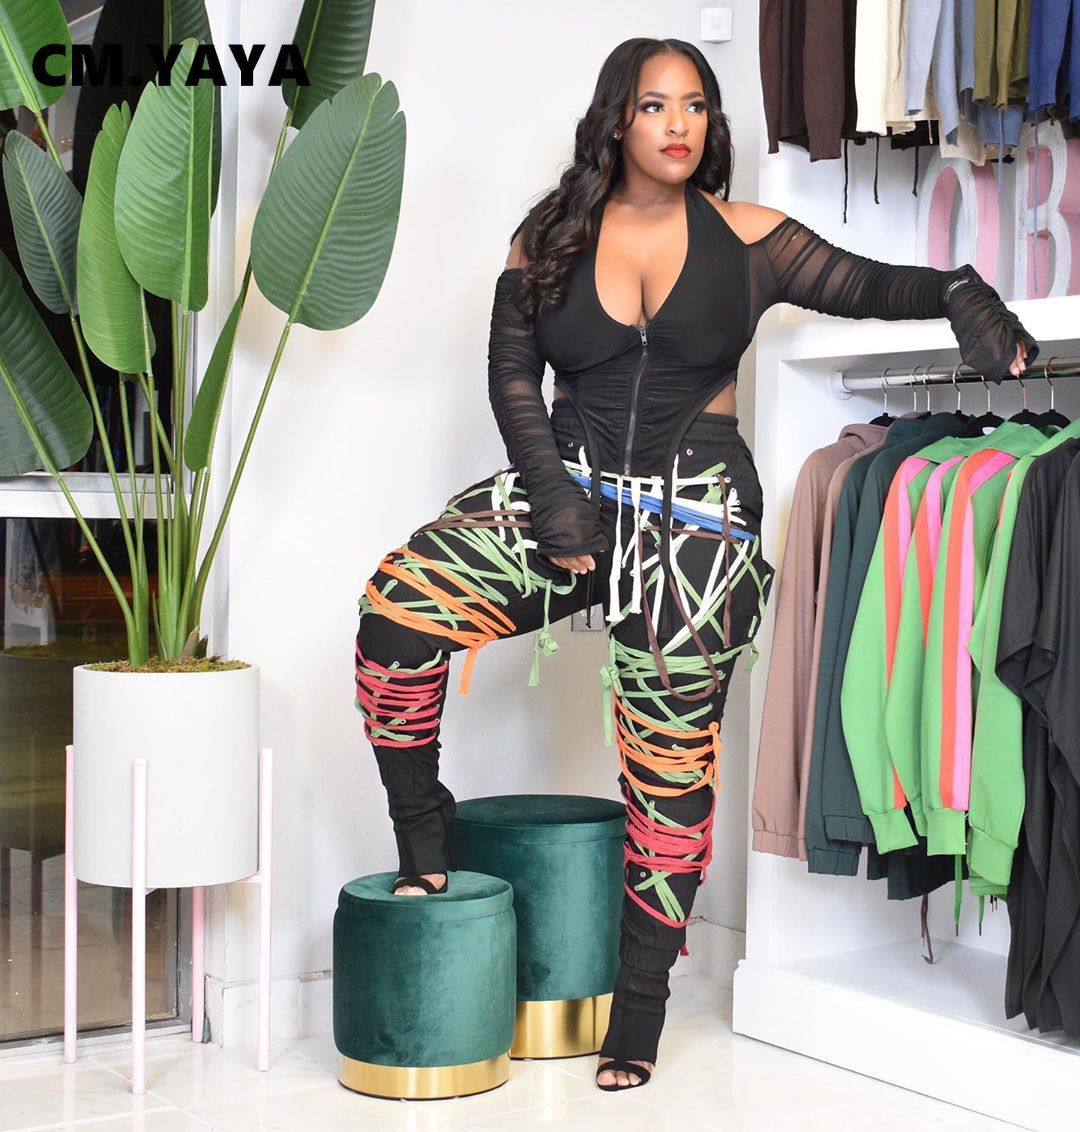 CM.YAYA Streetwear Frauen Lace Up Saiten Hosen Hohe Taille Hip Hop Hosen Active Sport Jogger Jogginghose